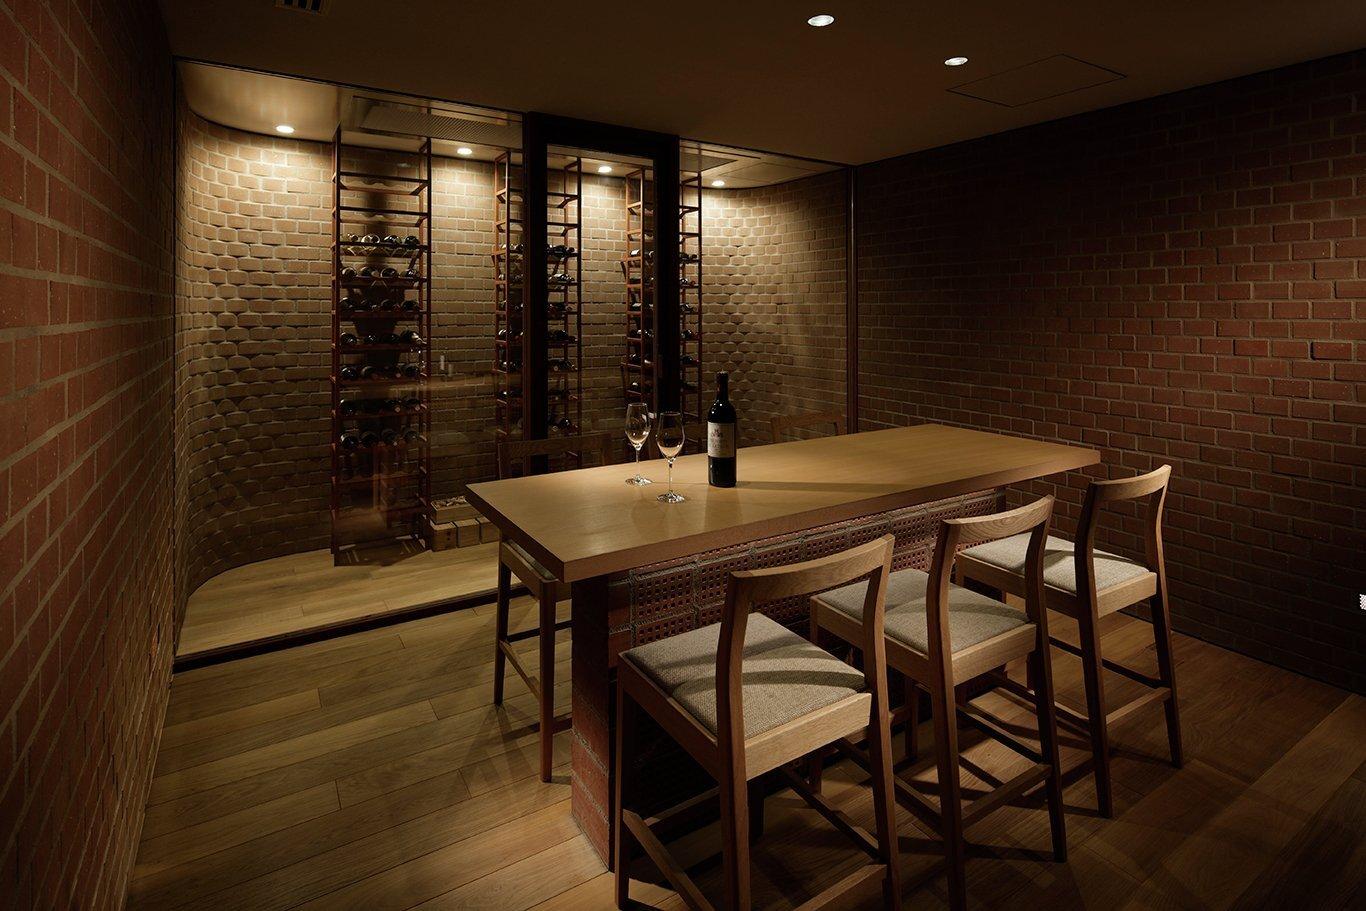 RebirthHouse - Ryo Matsui Architects - Japan - Wine Cellar - Humble Homes